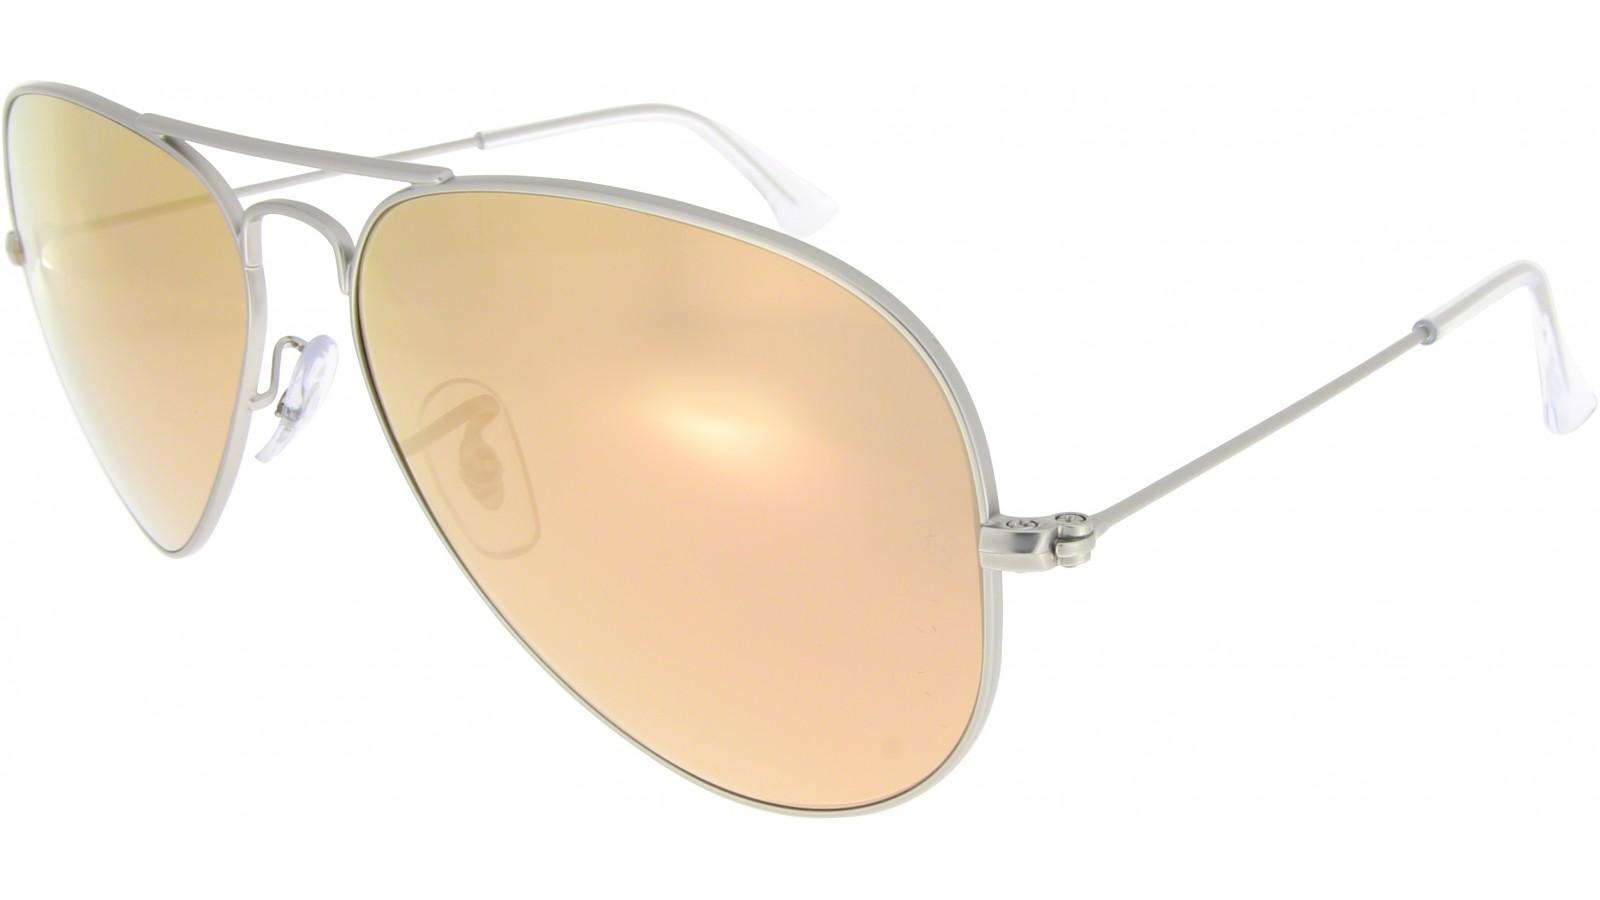 ray ban sonnenbrille aviator rb 3025 019 z2 2n 58 135. Black Bedroom Furniture Sets. Home Design Ideas